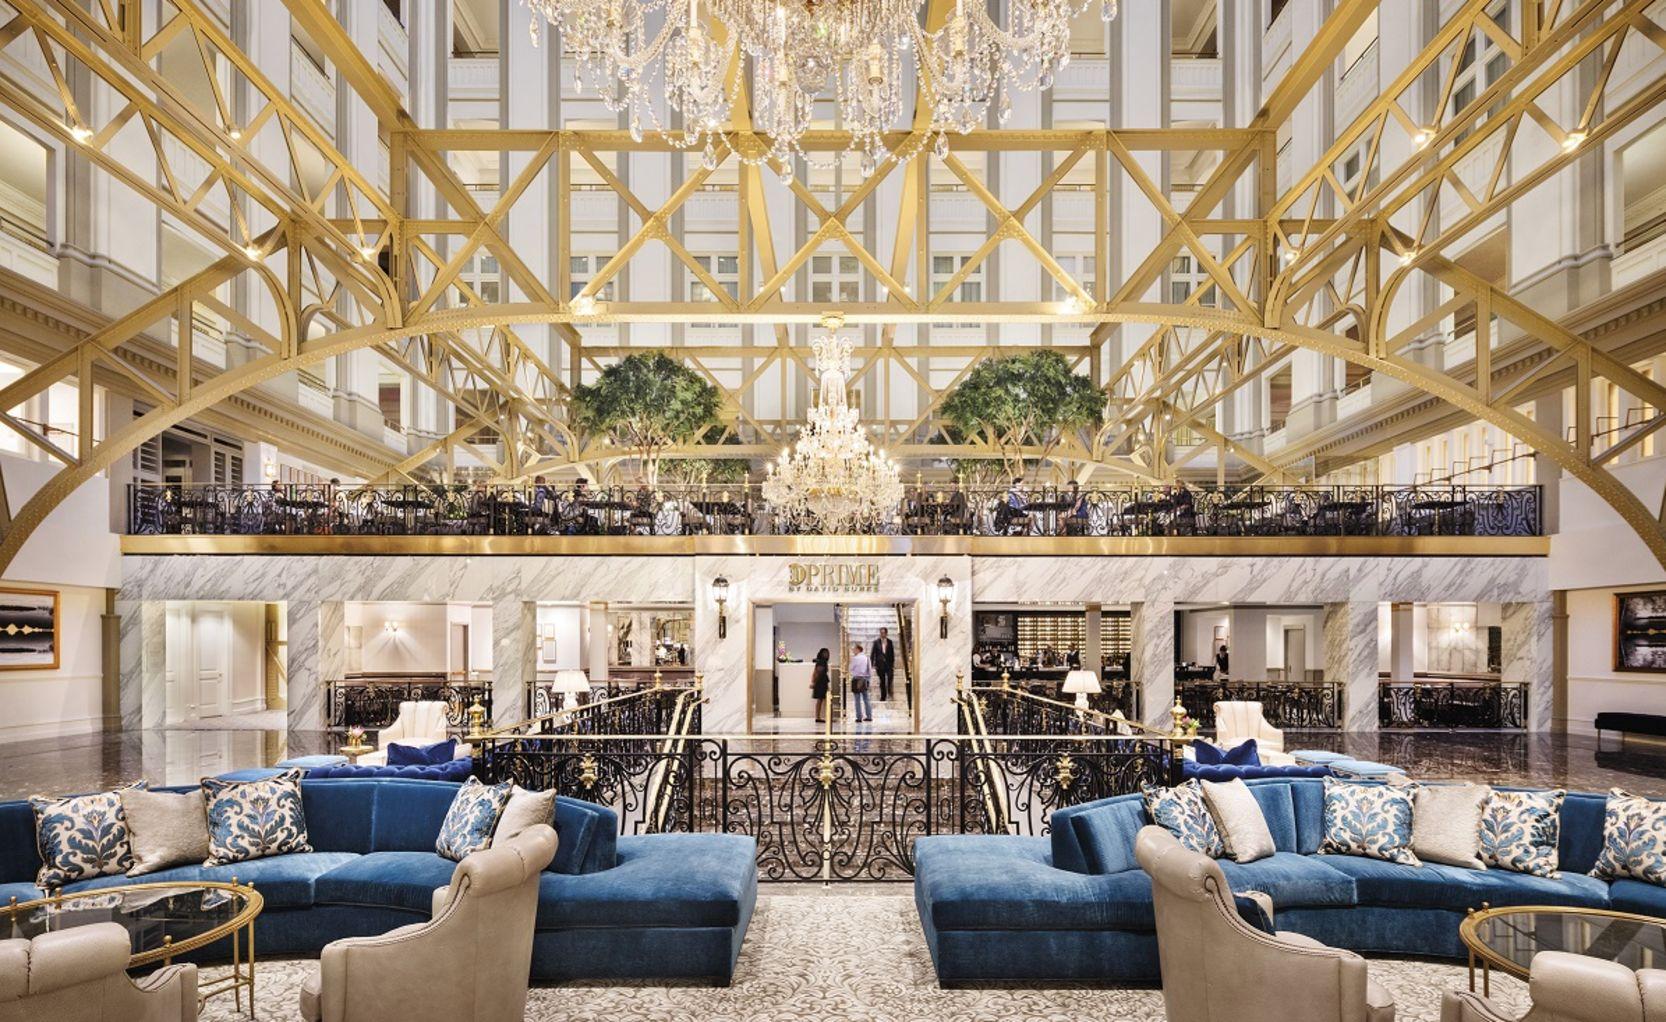 BLT Prime Restaurant Lobby View